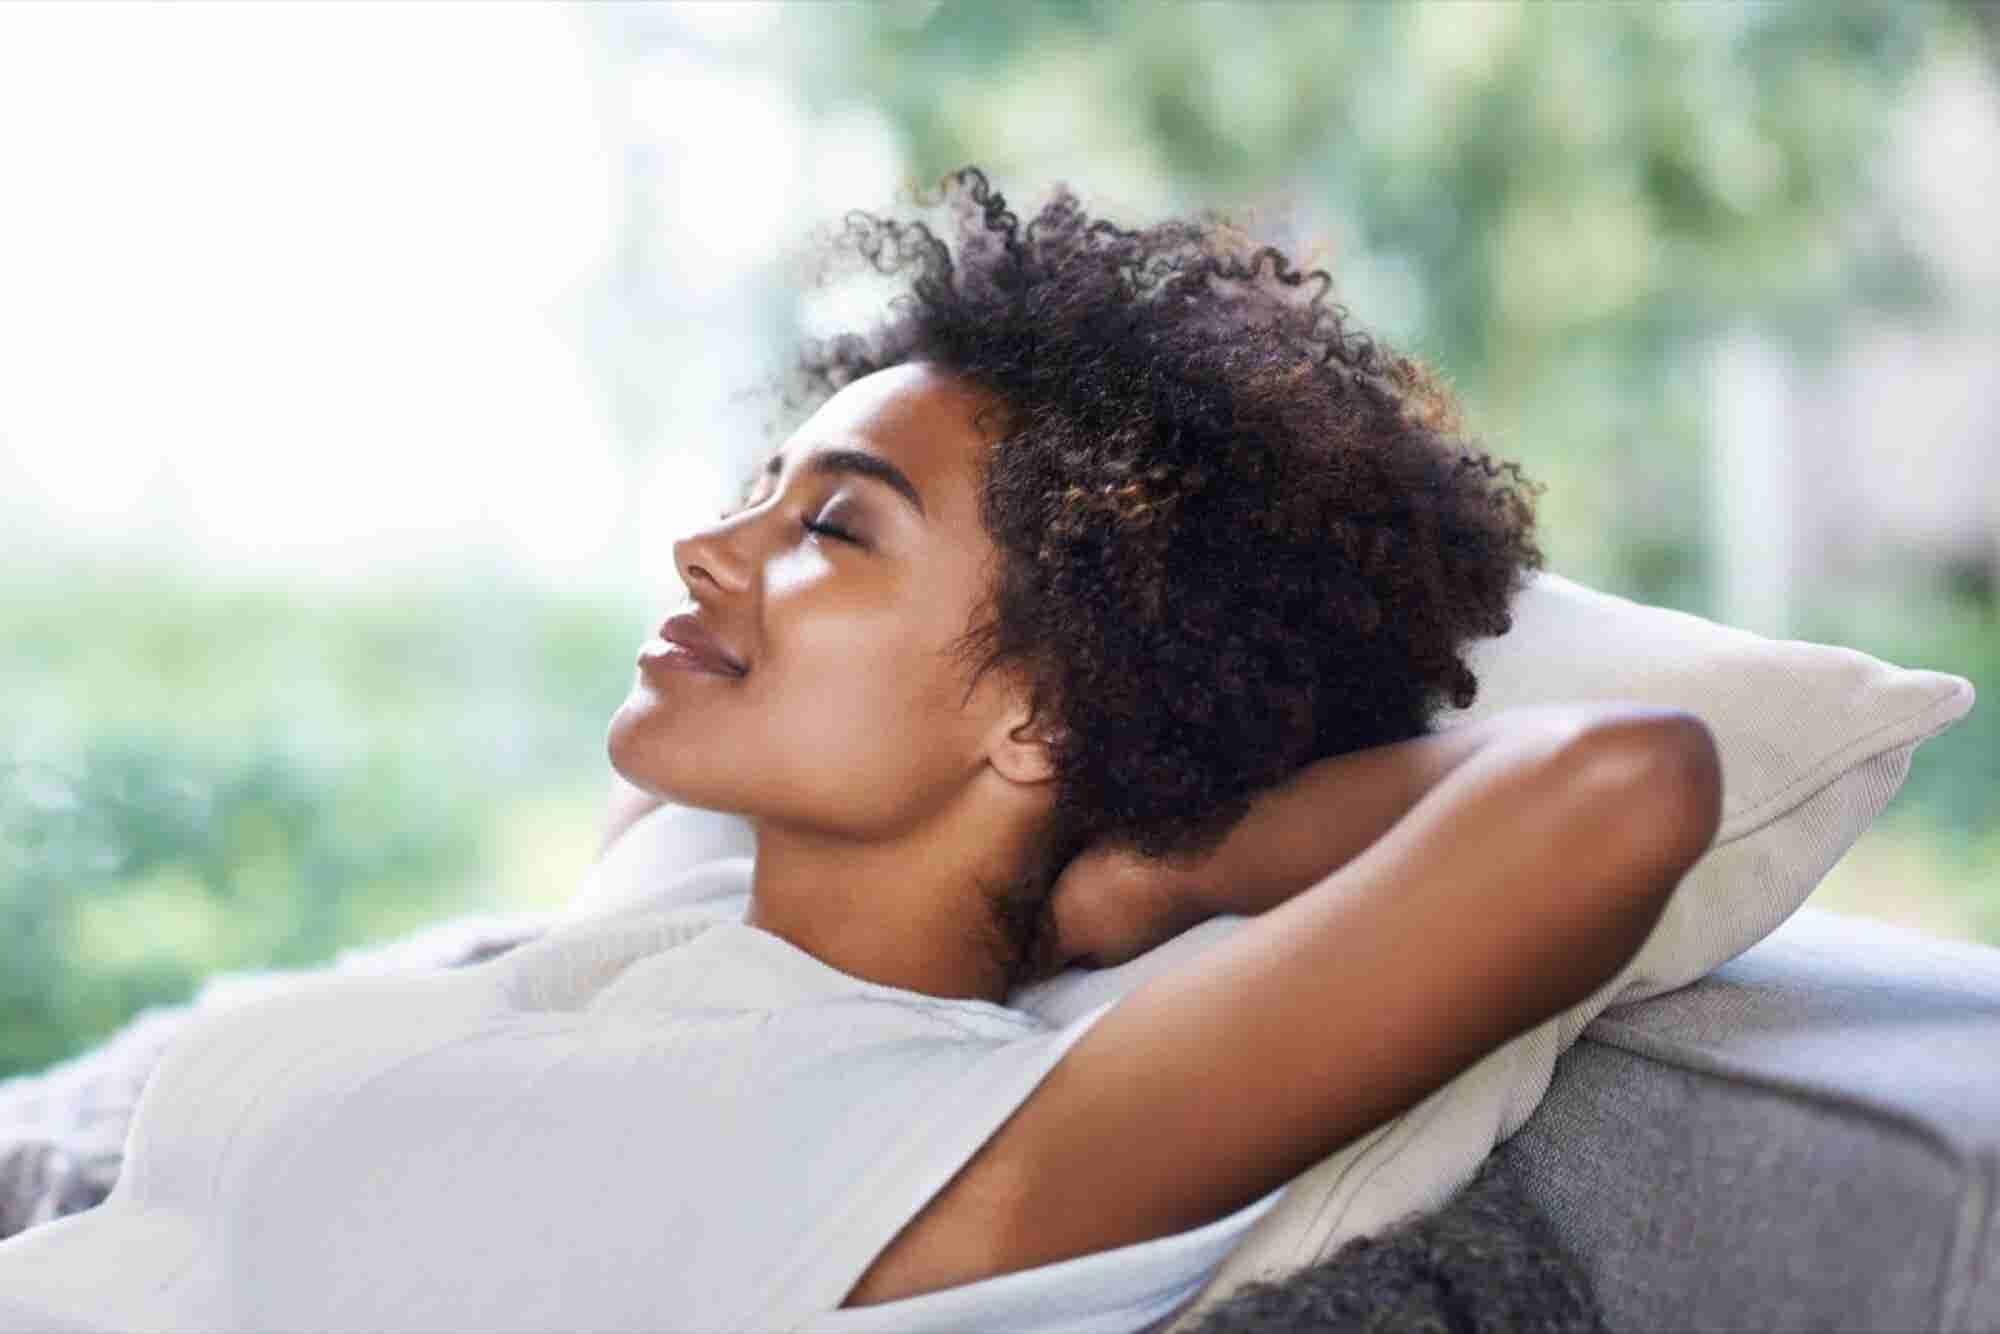 8 Ways to Make Money While You Sleep